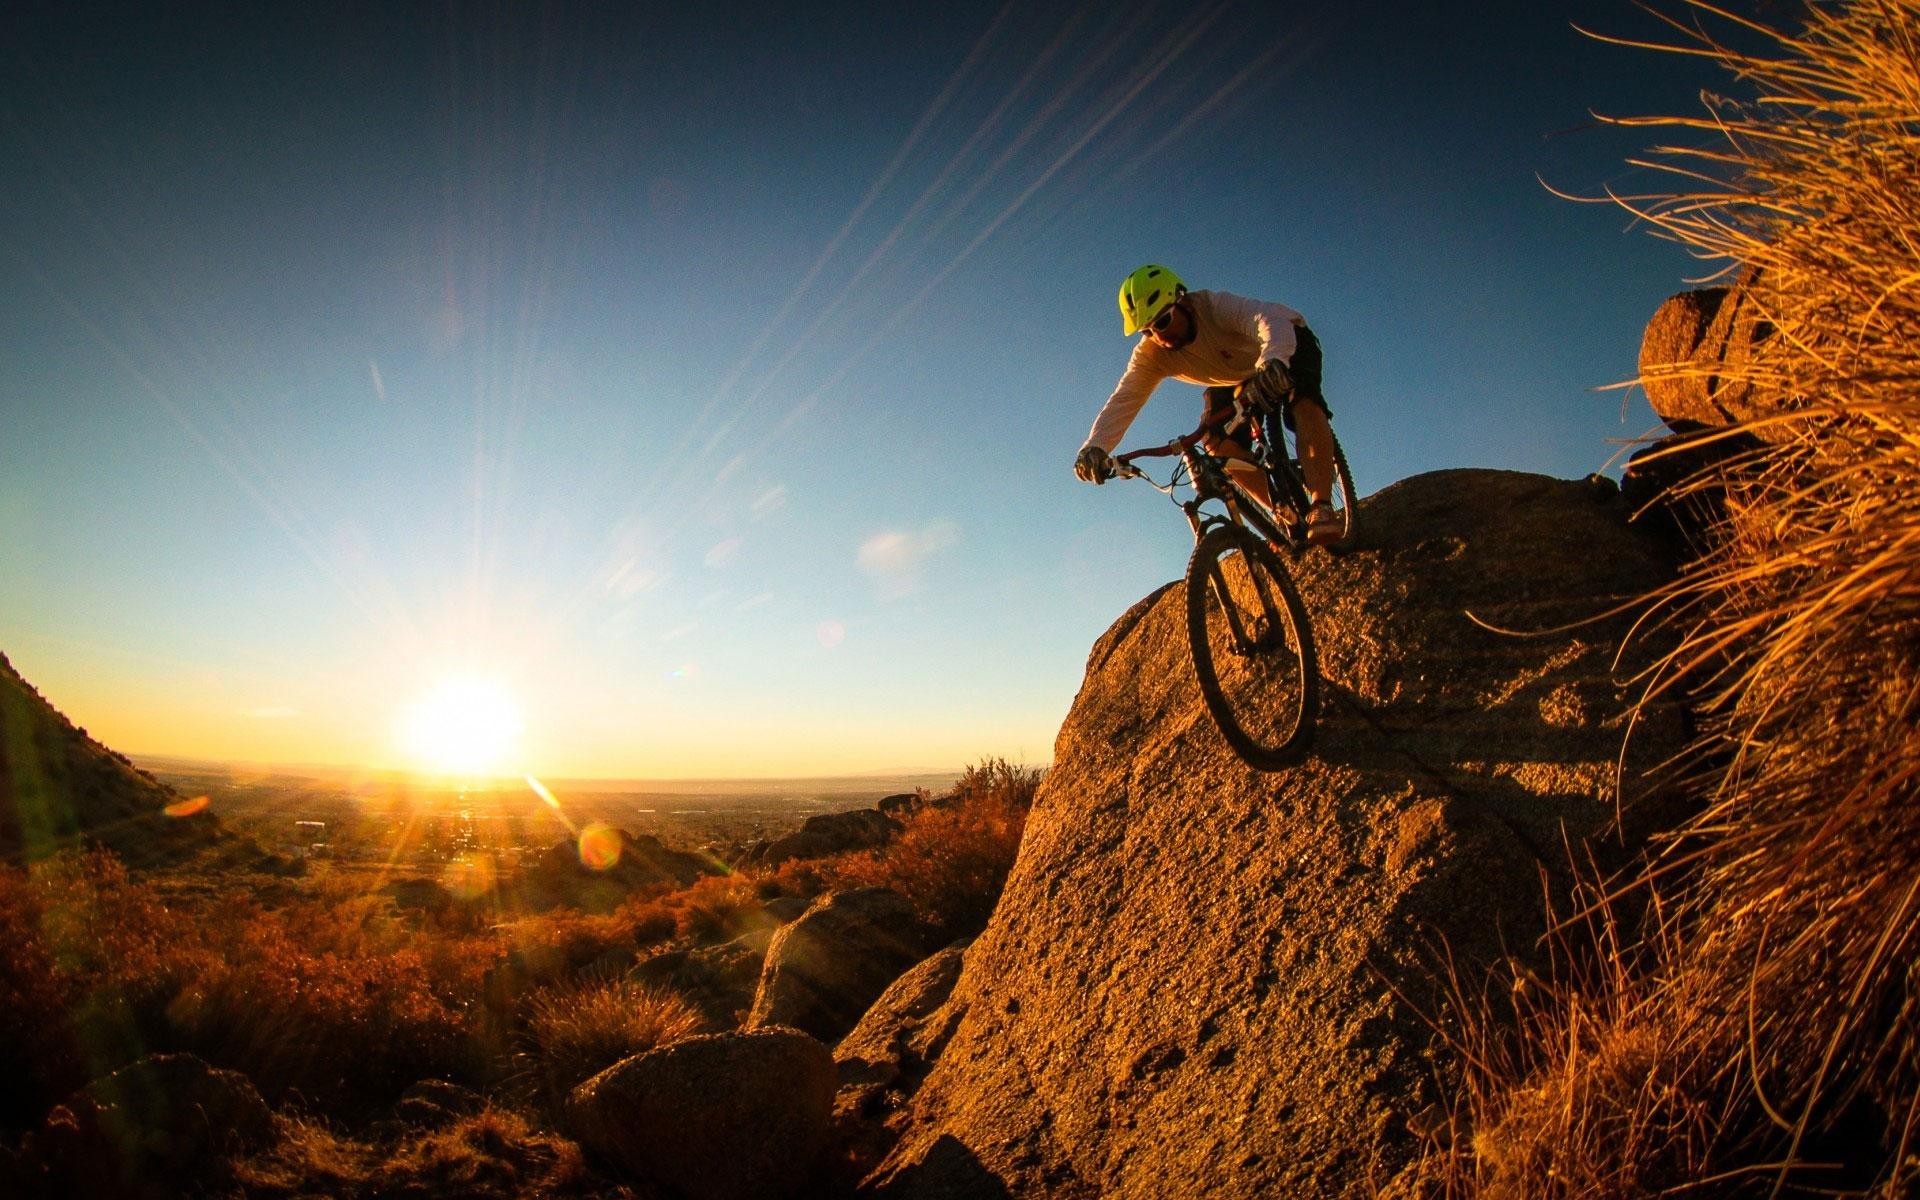 mountain biking hq desktop wallpaper 09290 - baltana